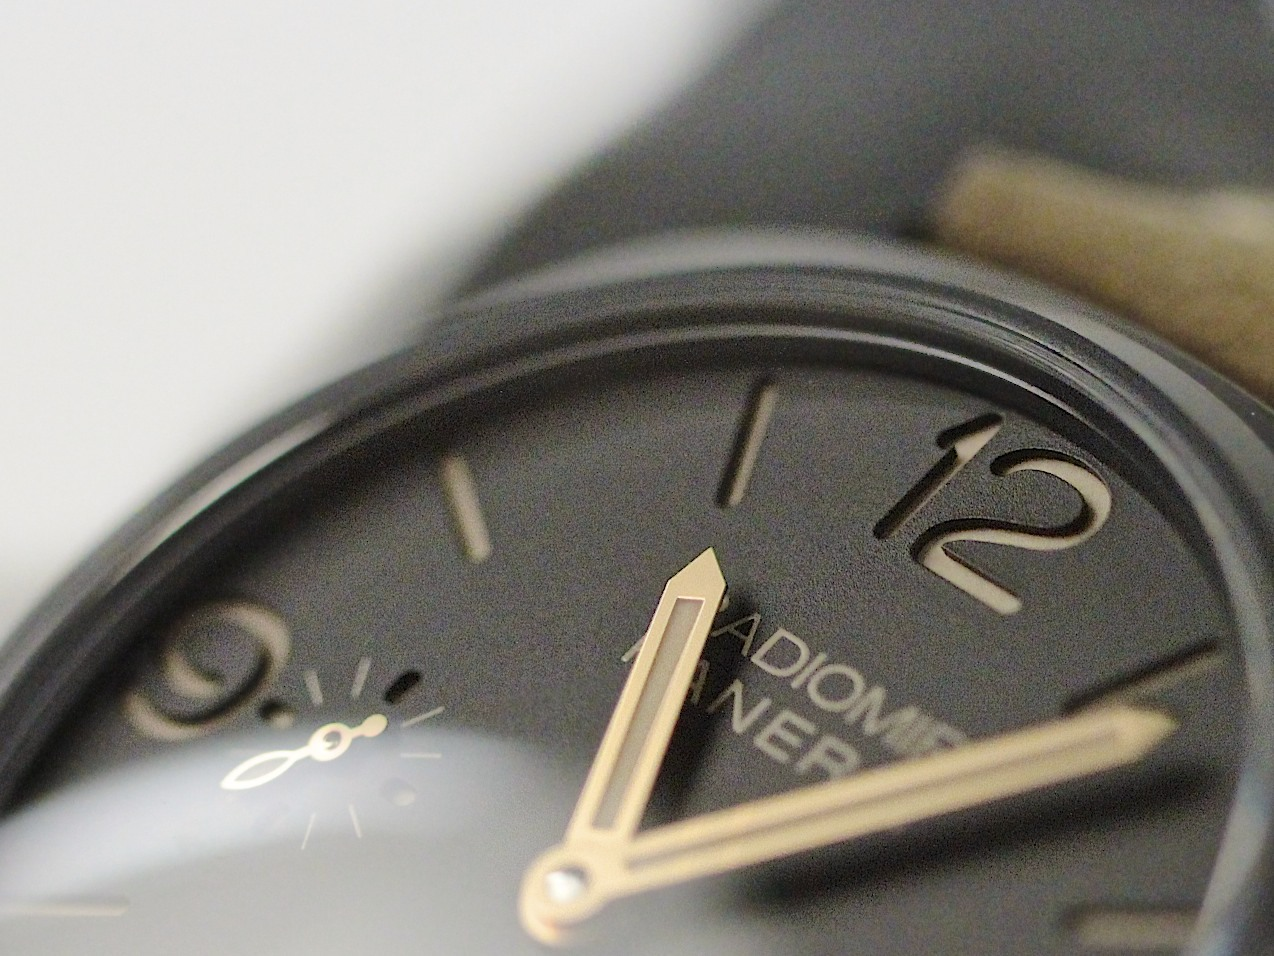 Dial & Gold Hands - New Panerai Watch - Radiomir Composite 3 Days PAM 504 www.Legendoftime.com - Chicago Watch Center